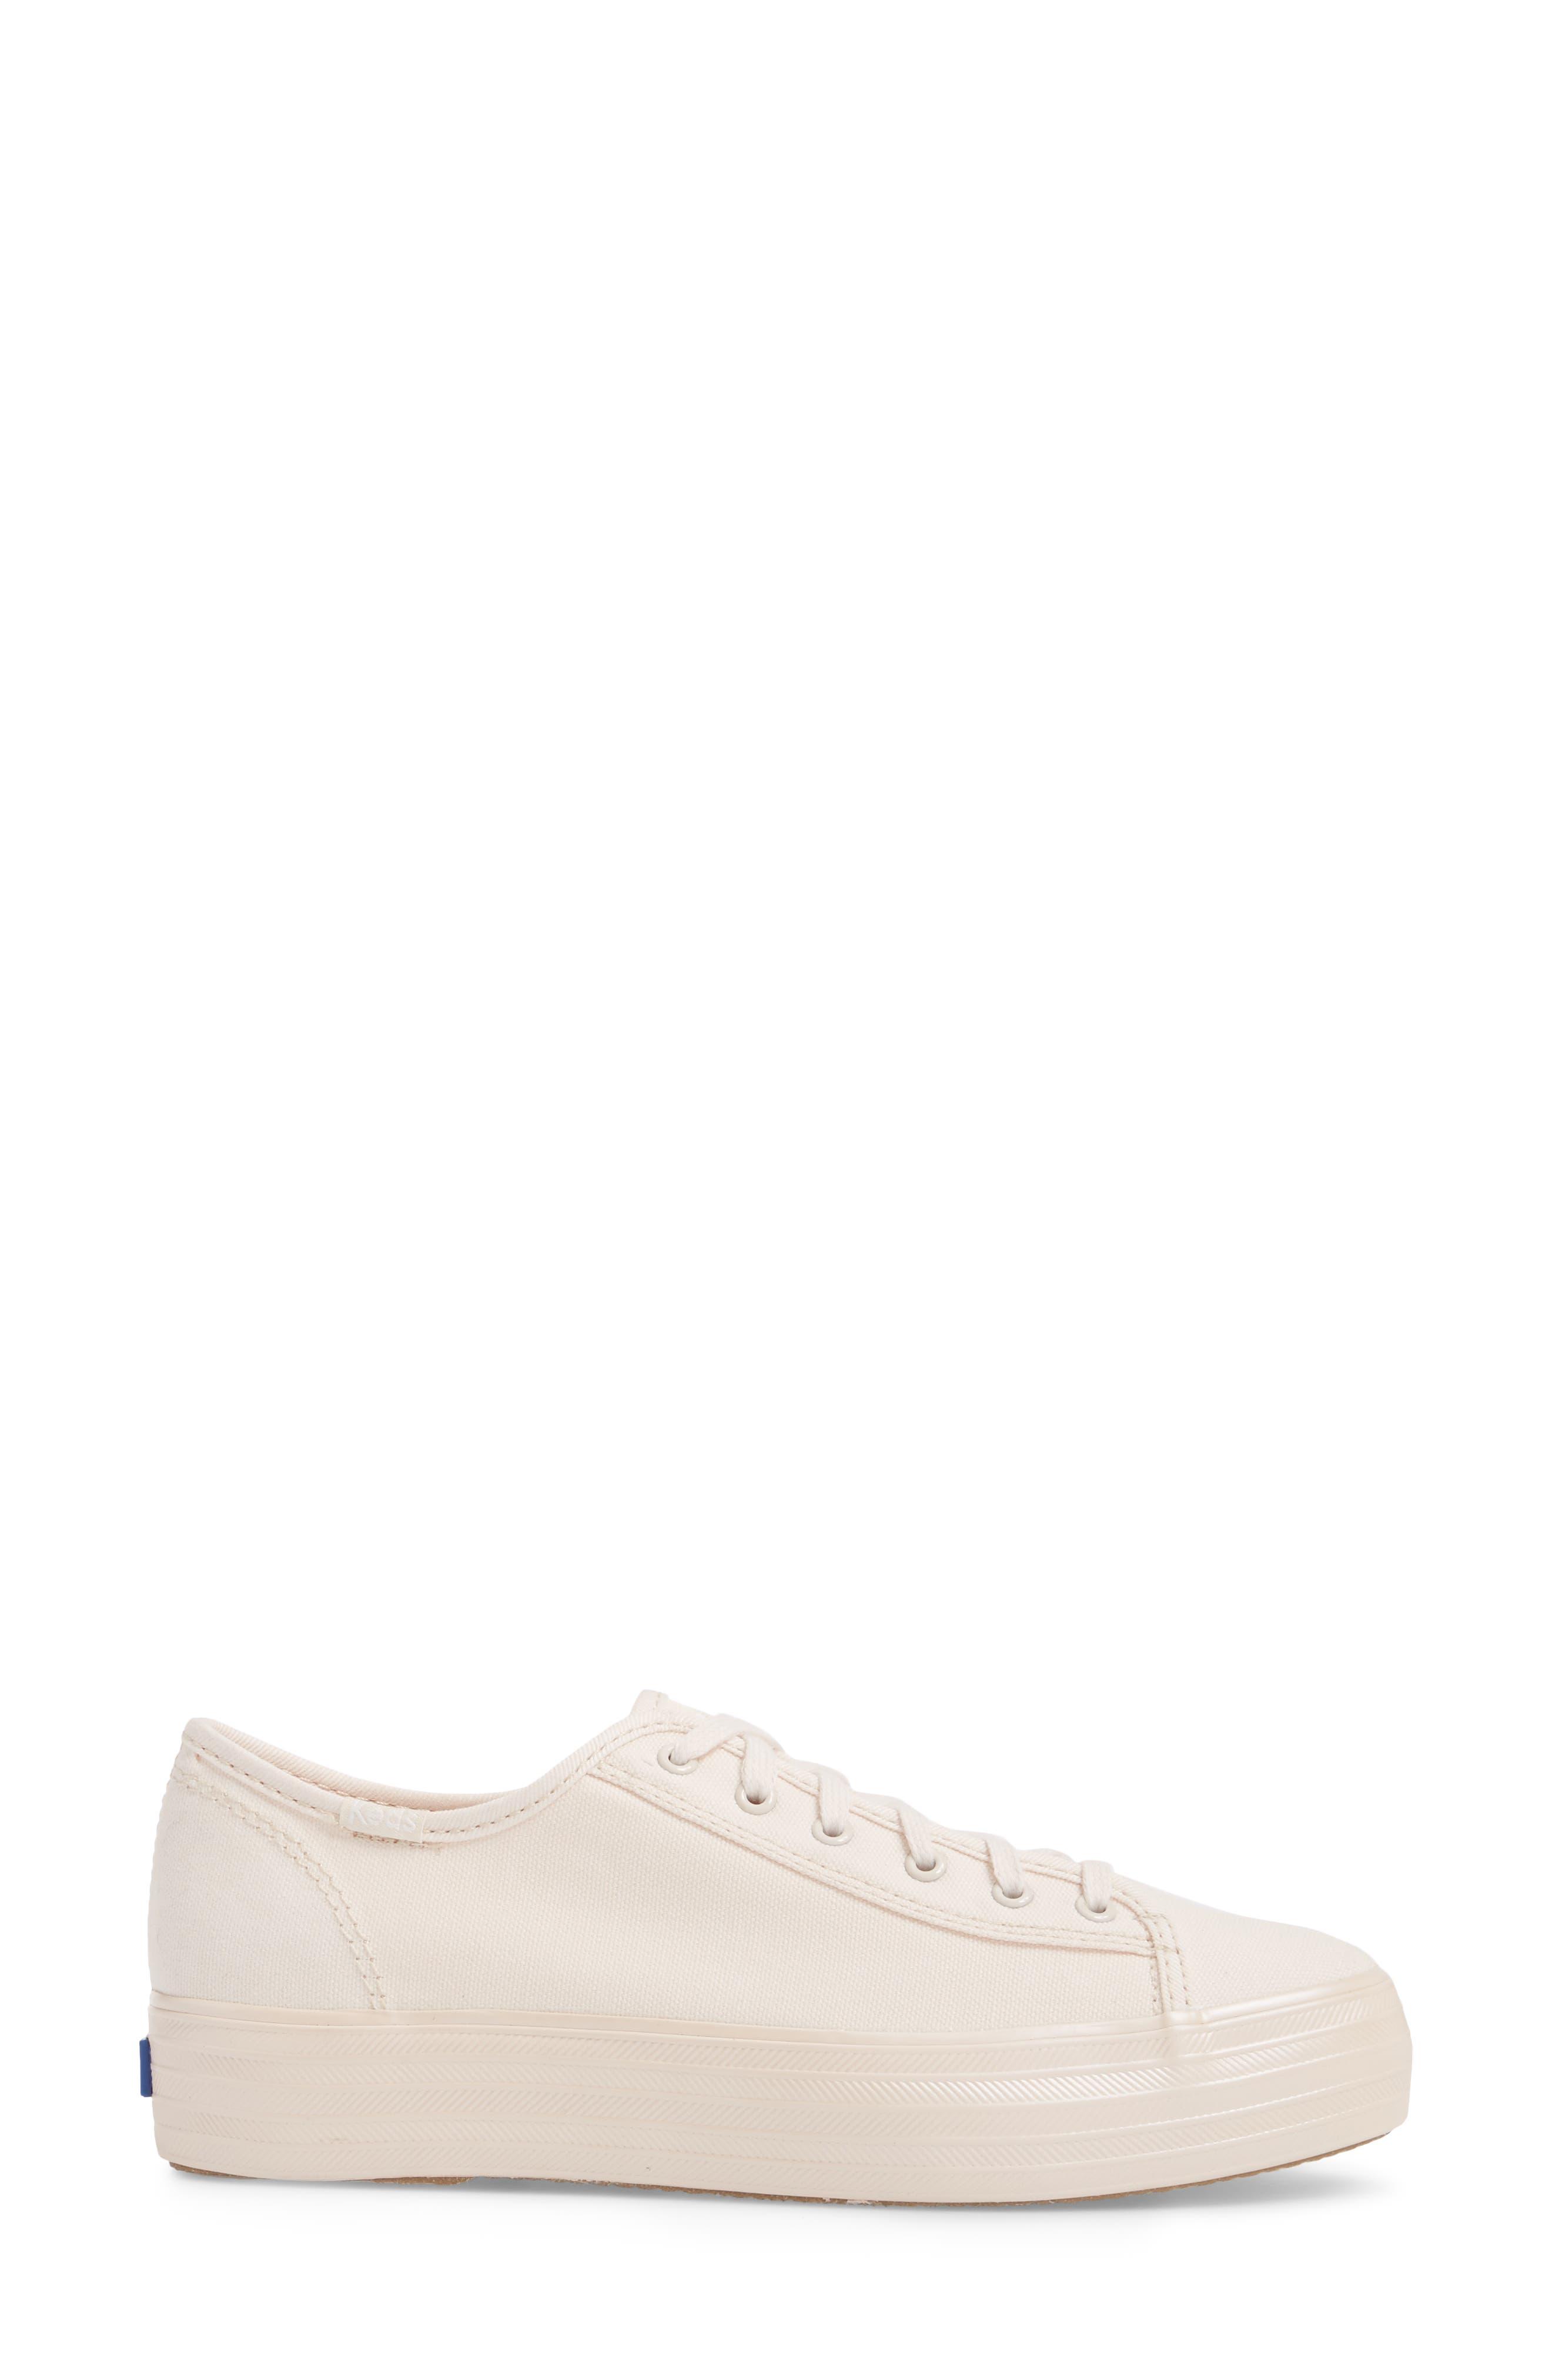 Triple Kick Lace-Up Sneaker,                             Alternate thumbnail 3, color,                             680